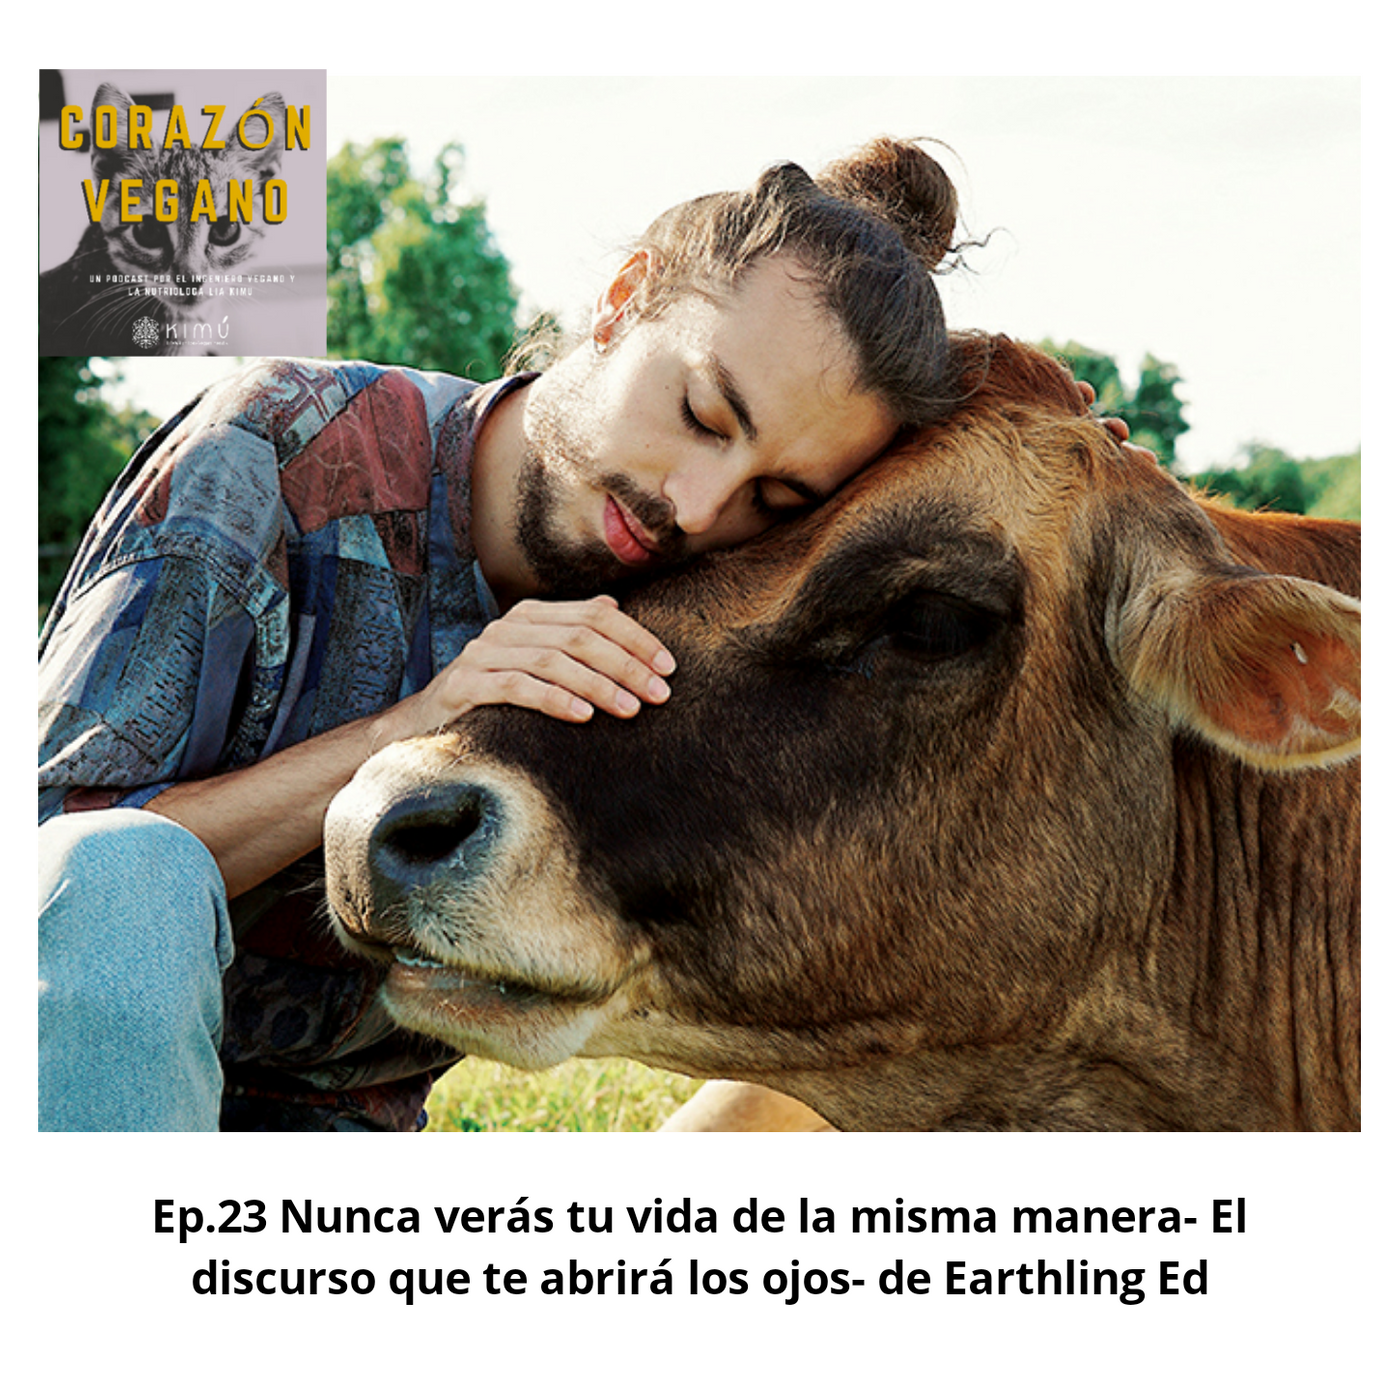 Ep.23 Nunca verás tu vida de la misma manera- de Earthling Ed